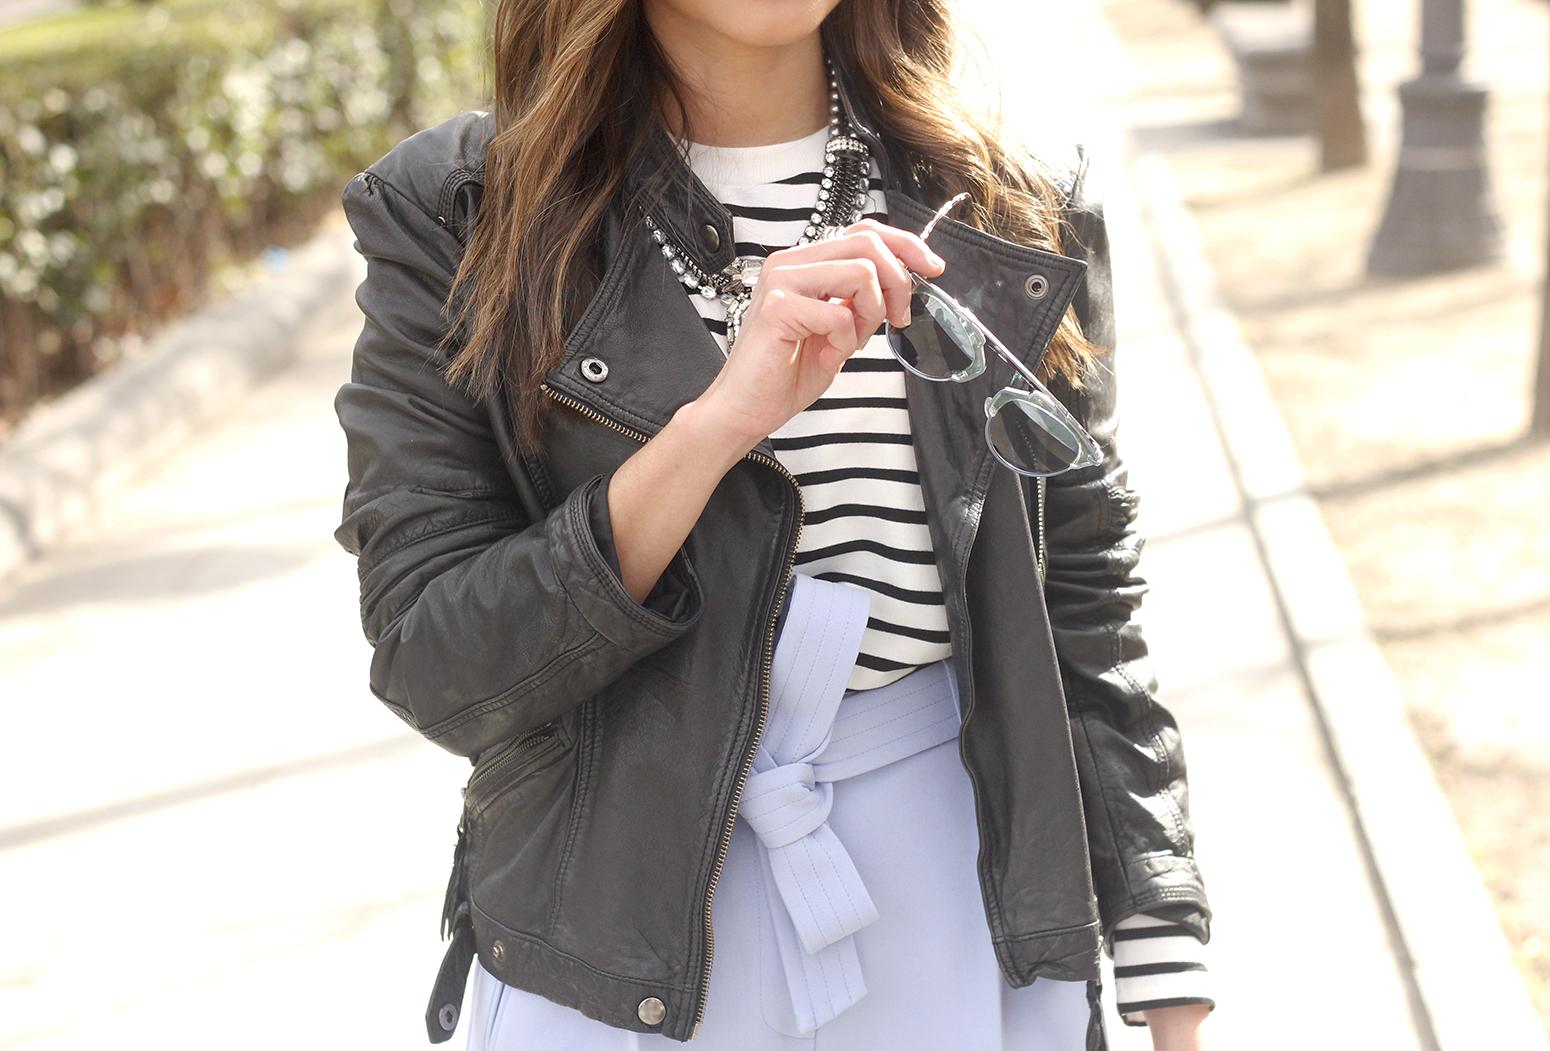 Light Blue Pallazzo pants t-shirt stripes black heels biker jacket dior so real sunglasses outfit style fashion14